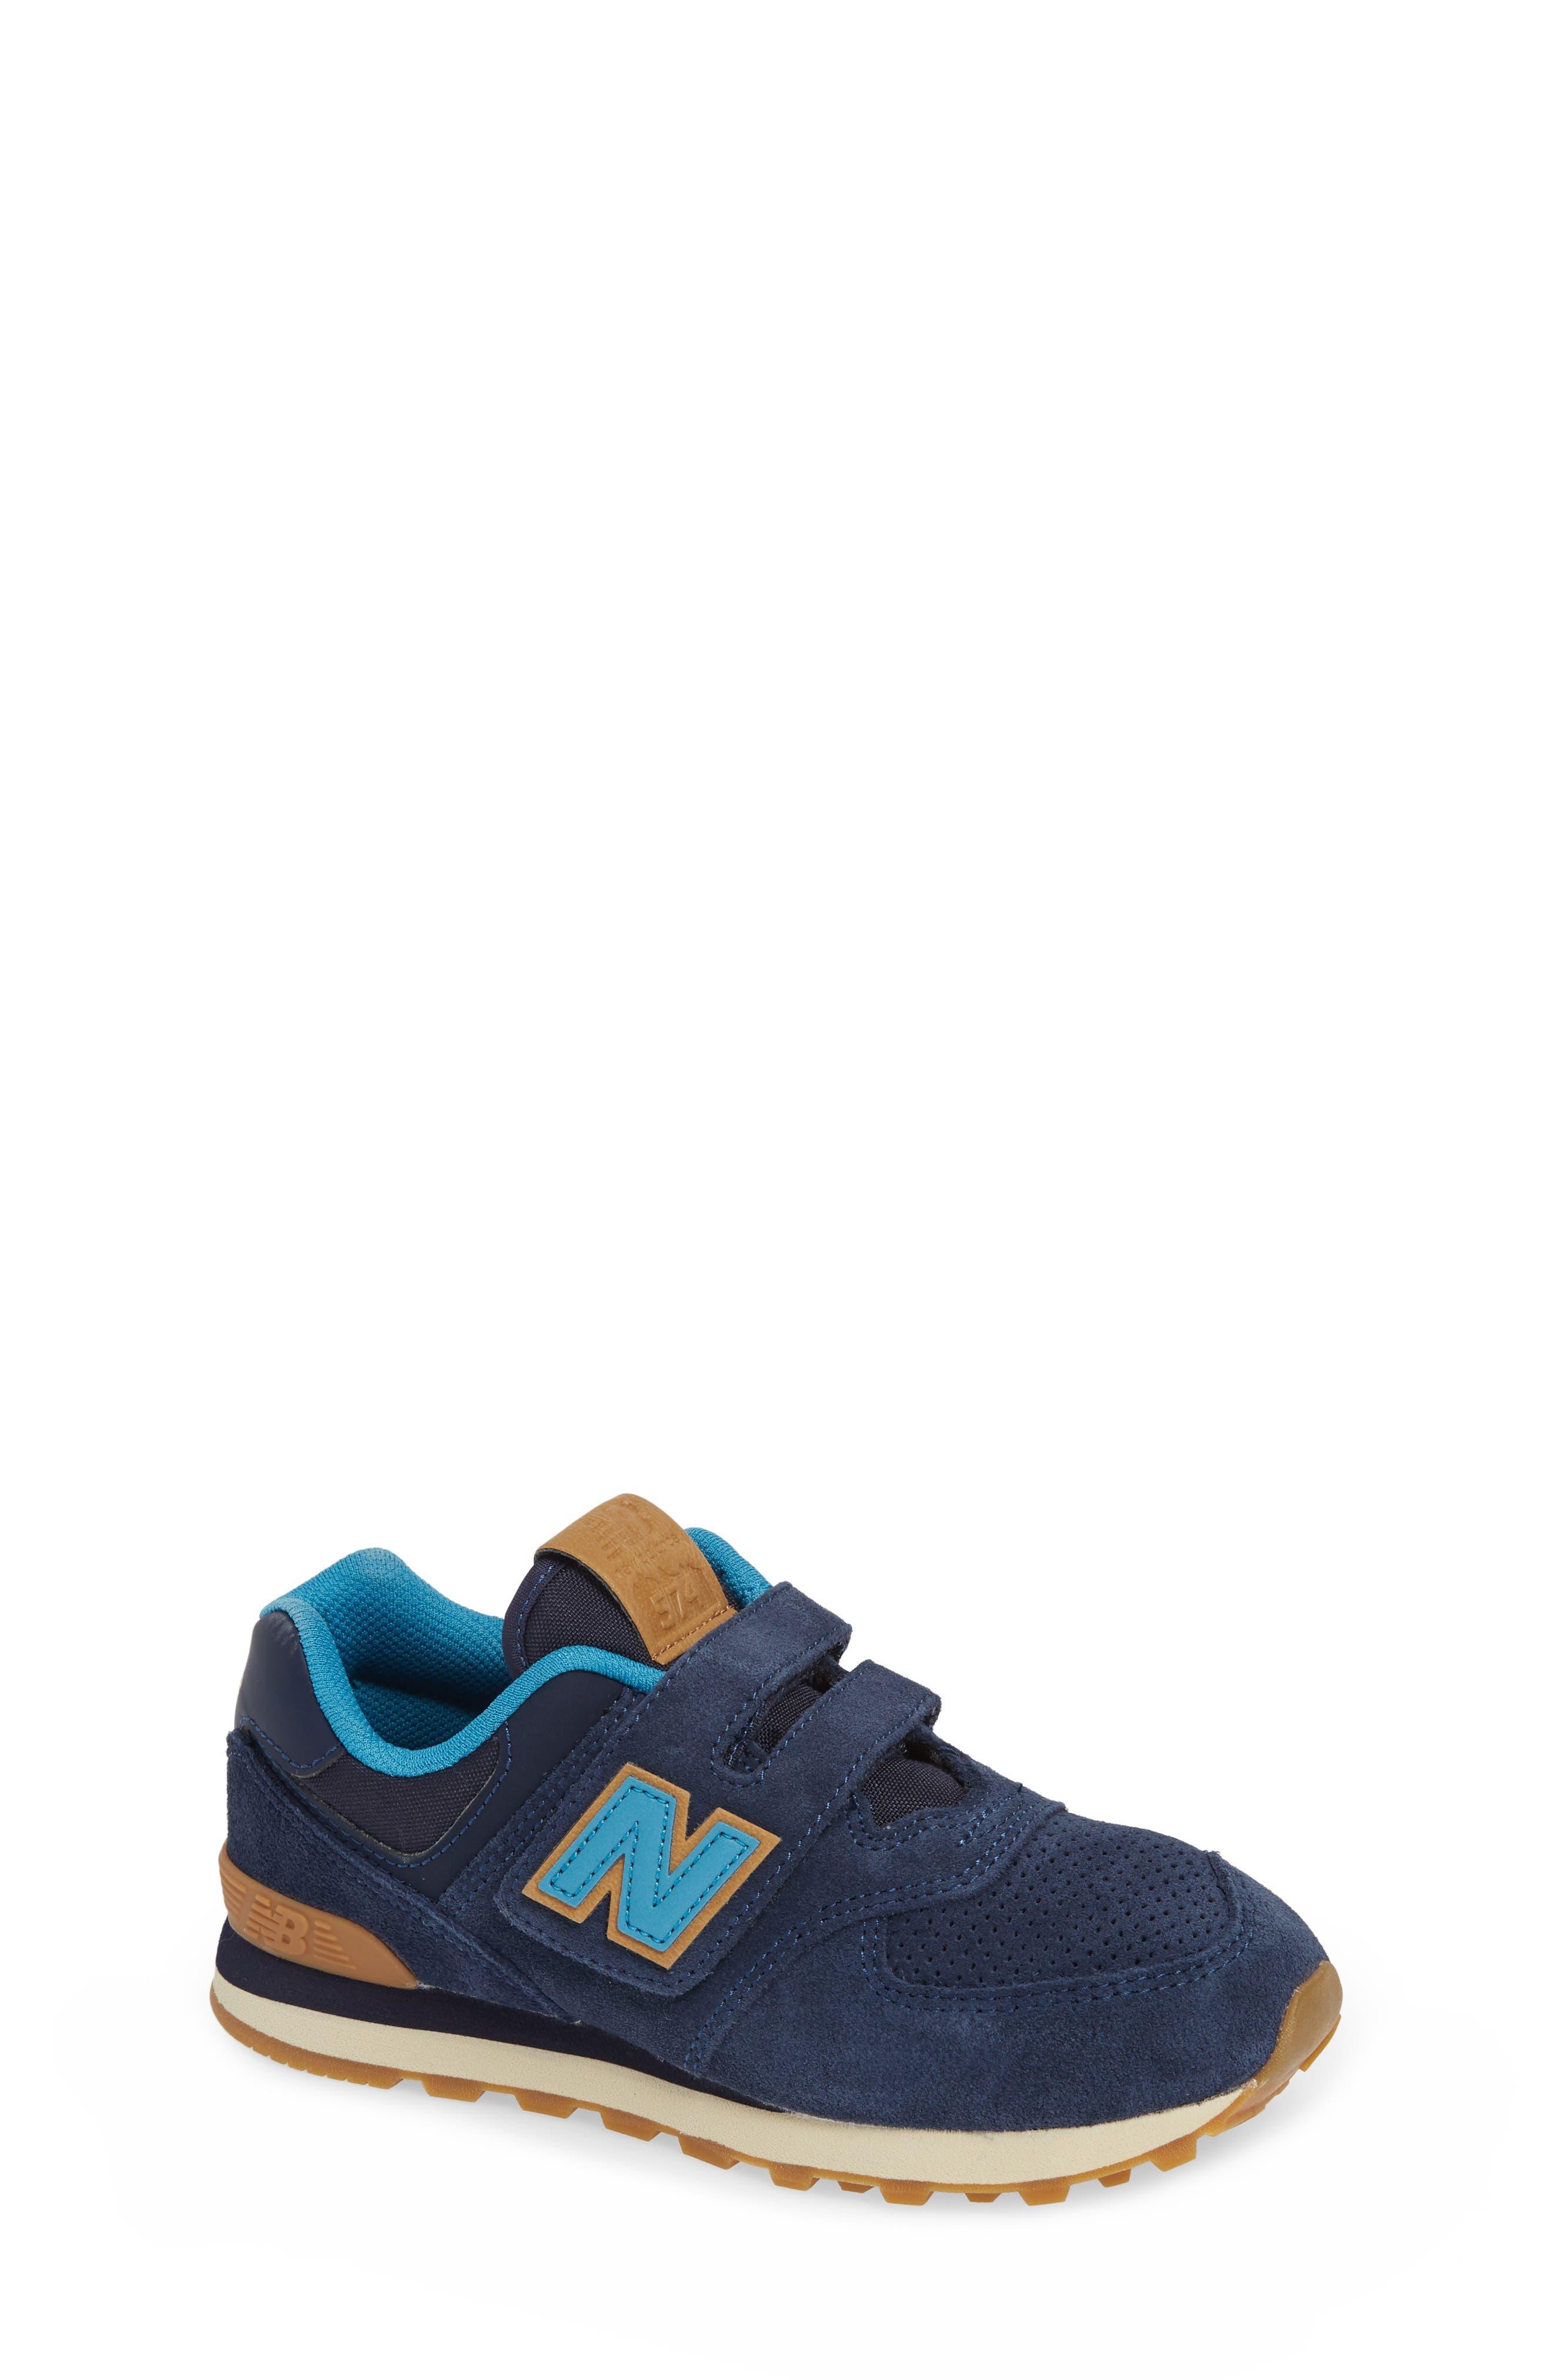 574 Sneaker,                         Main,                         color, PIGMENT